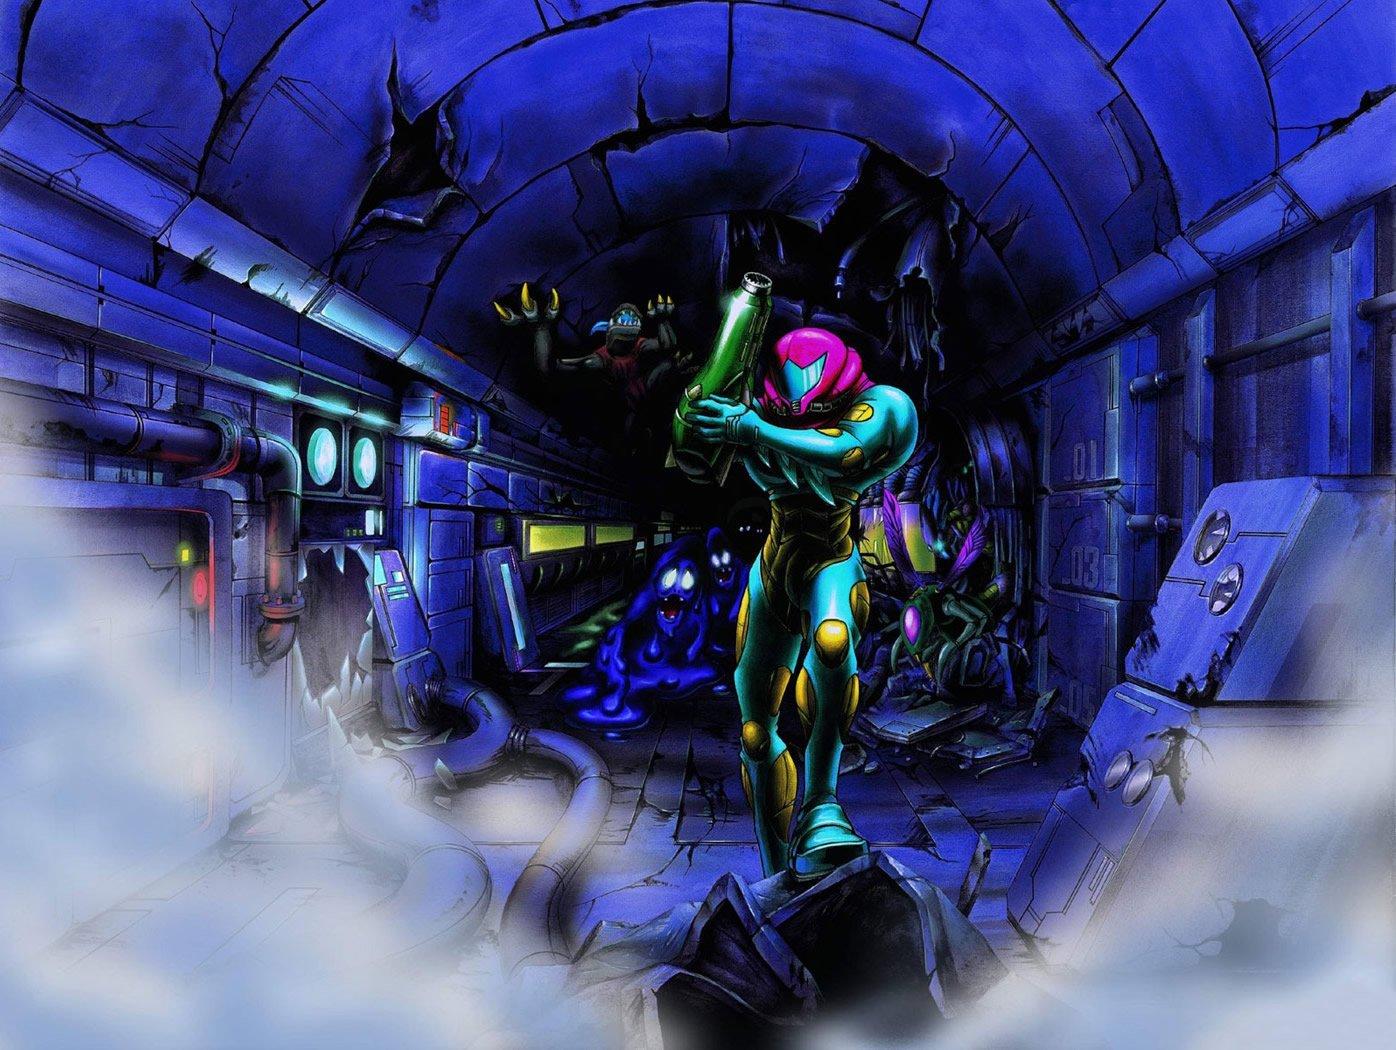 Metroid Fusion Concept art - image courtesy of Metroid Recon